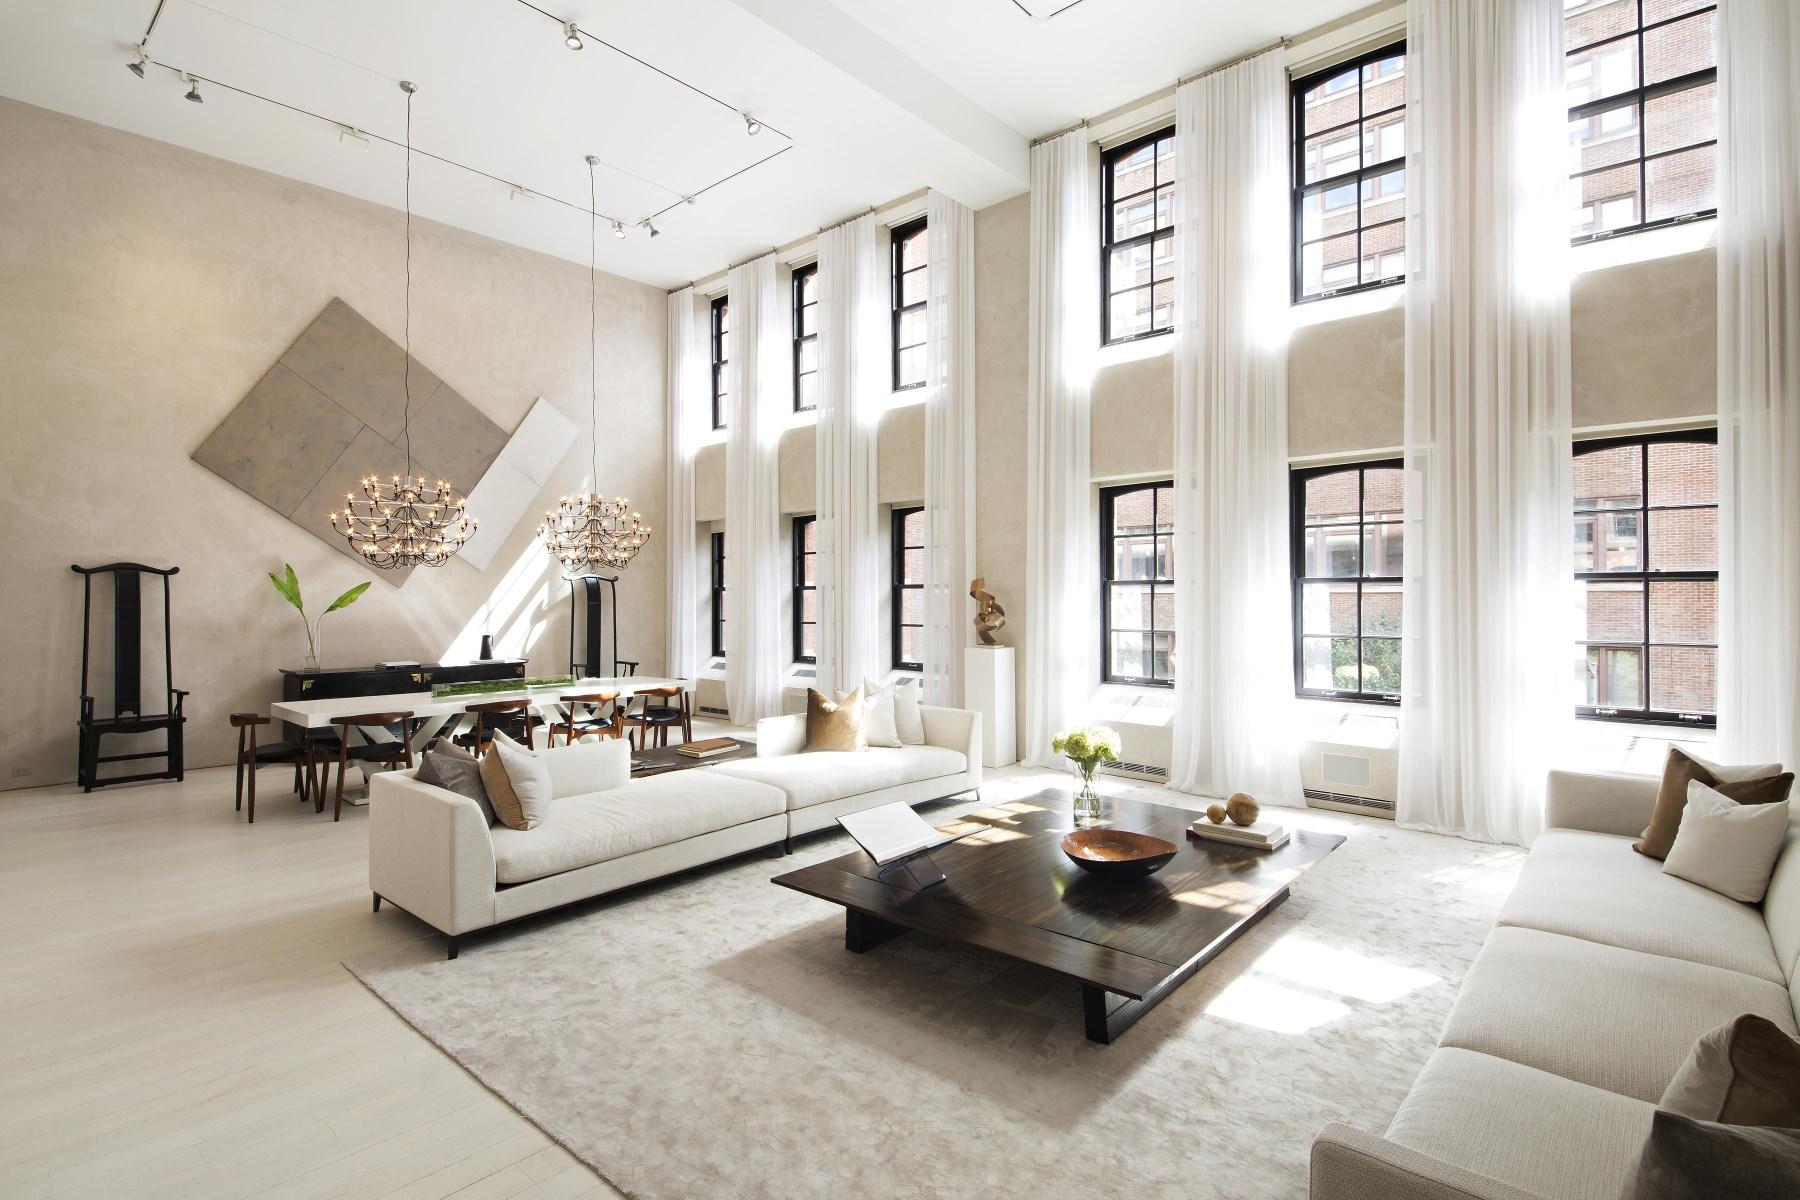 Condominium for Sale at 43 Clarkson Street 43 Clarkson Street Apt 234A New York, New York, 10014 United States